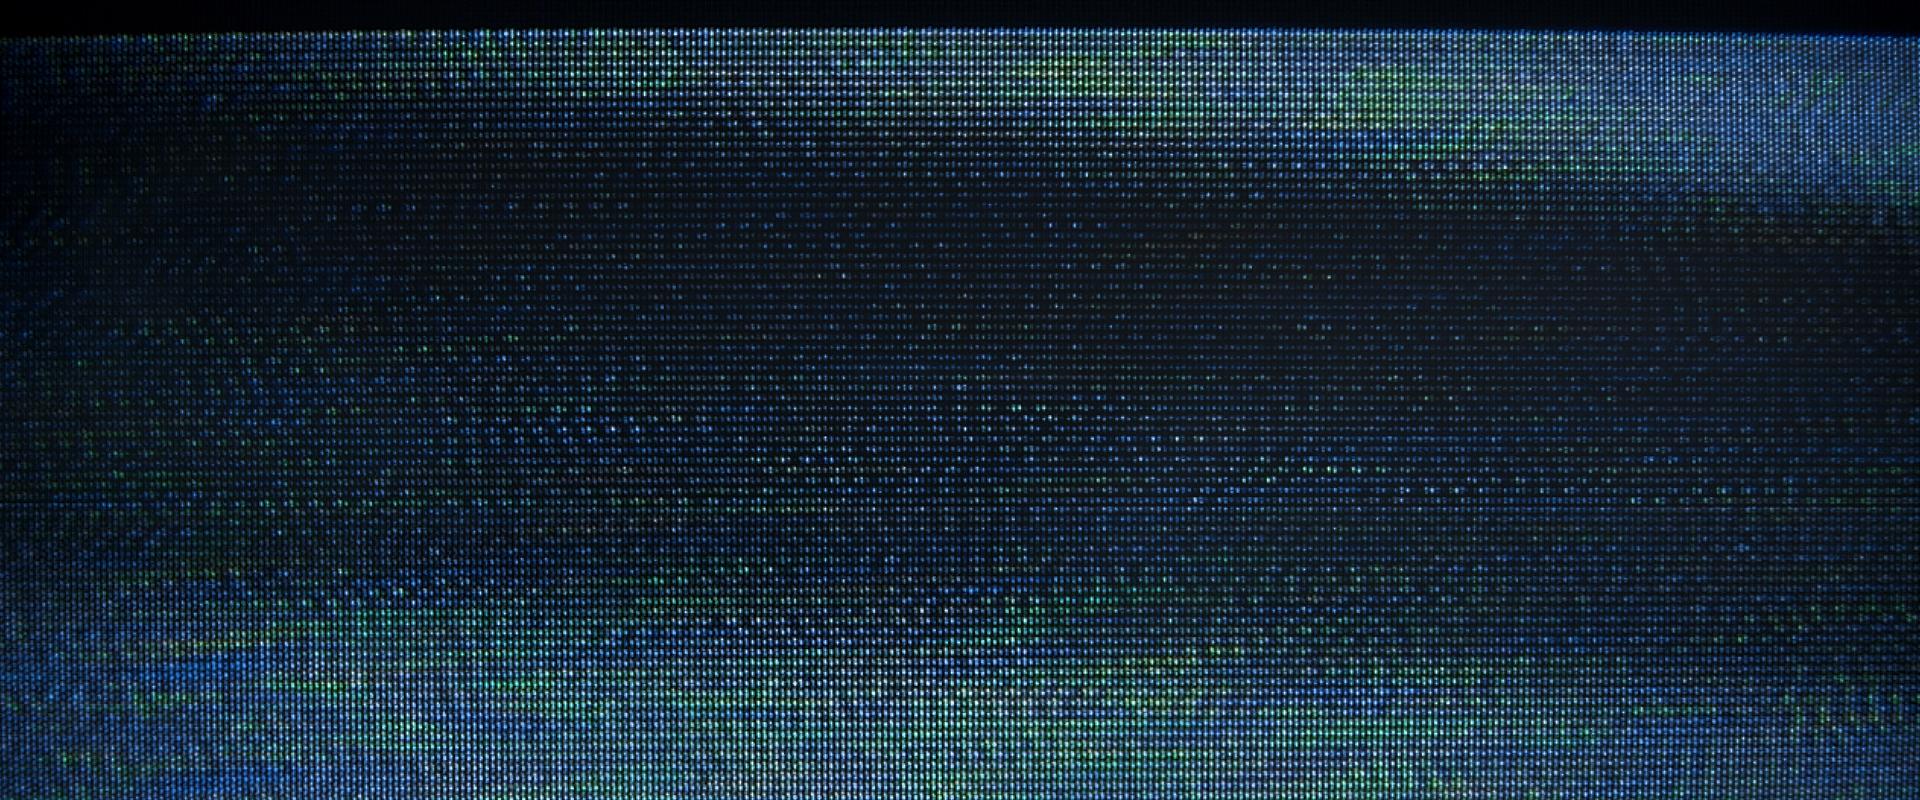 2088_CTM_web__0001_2088-003.00001628.jpg